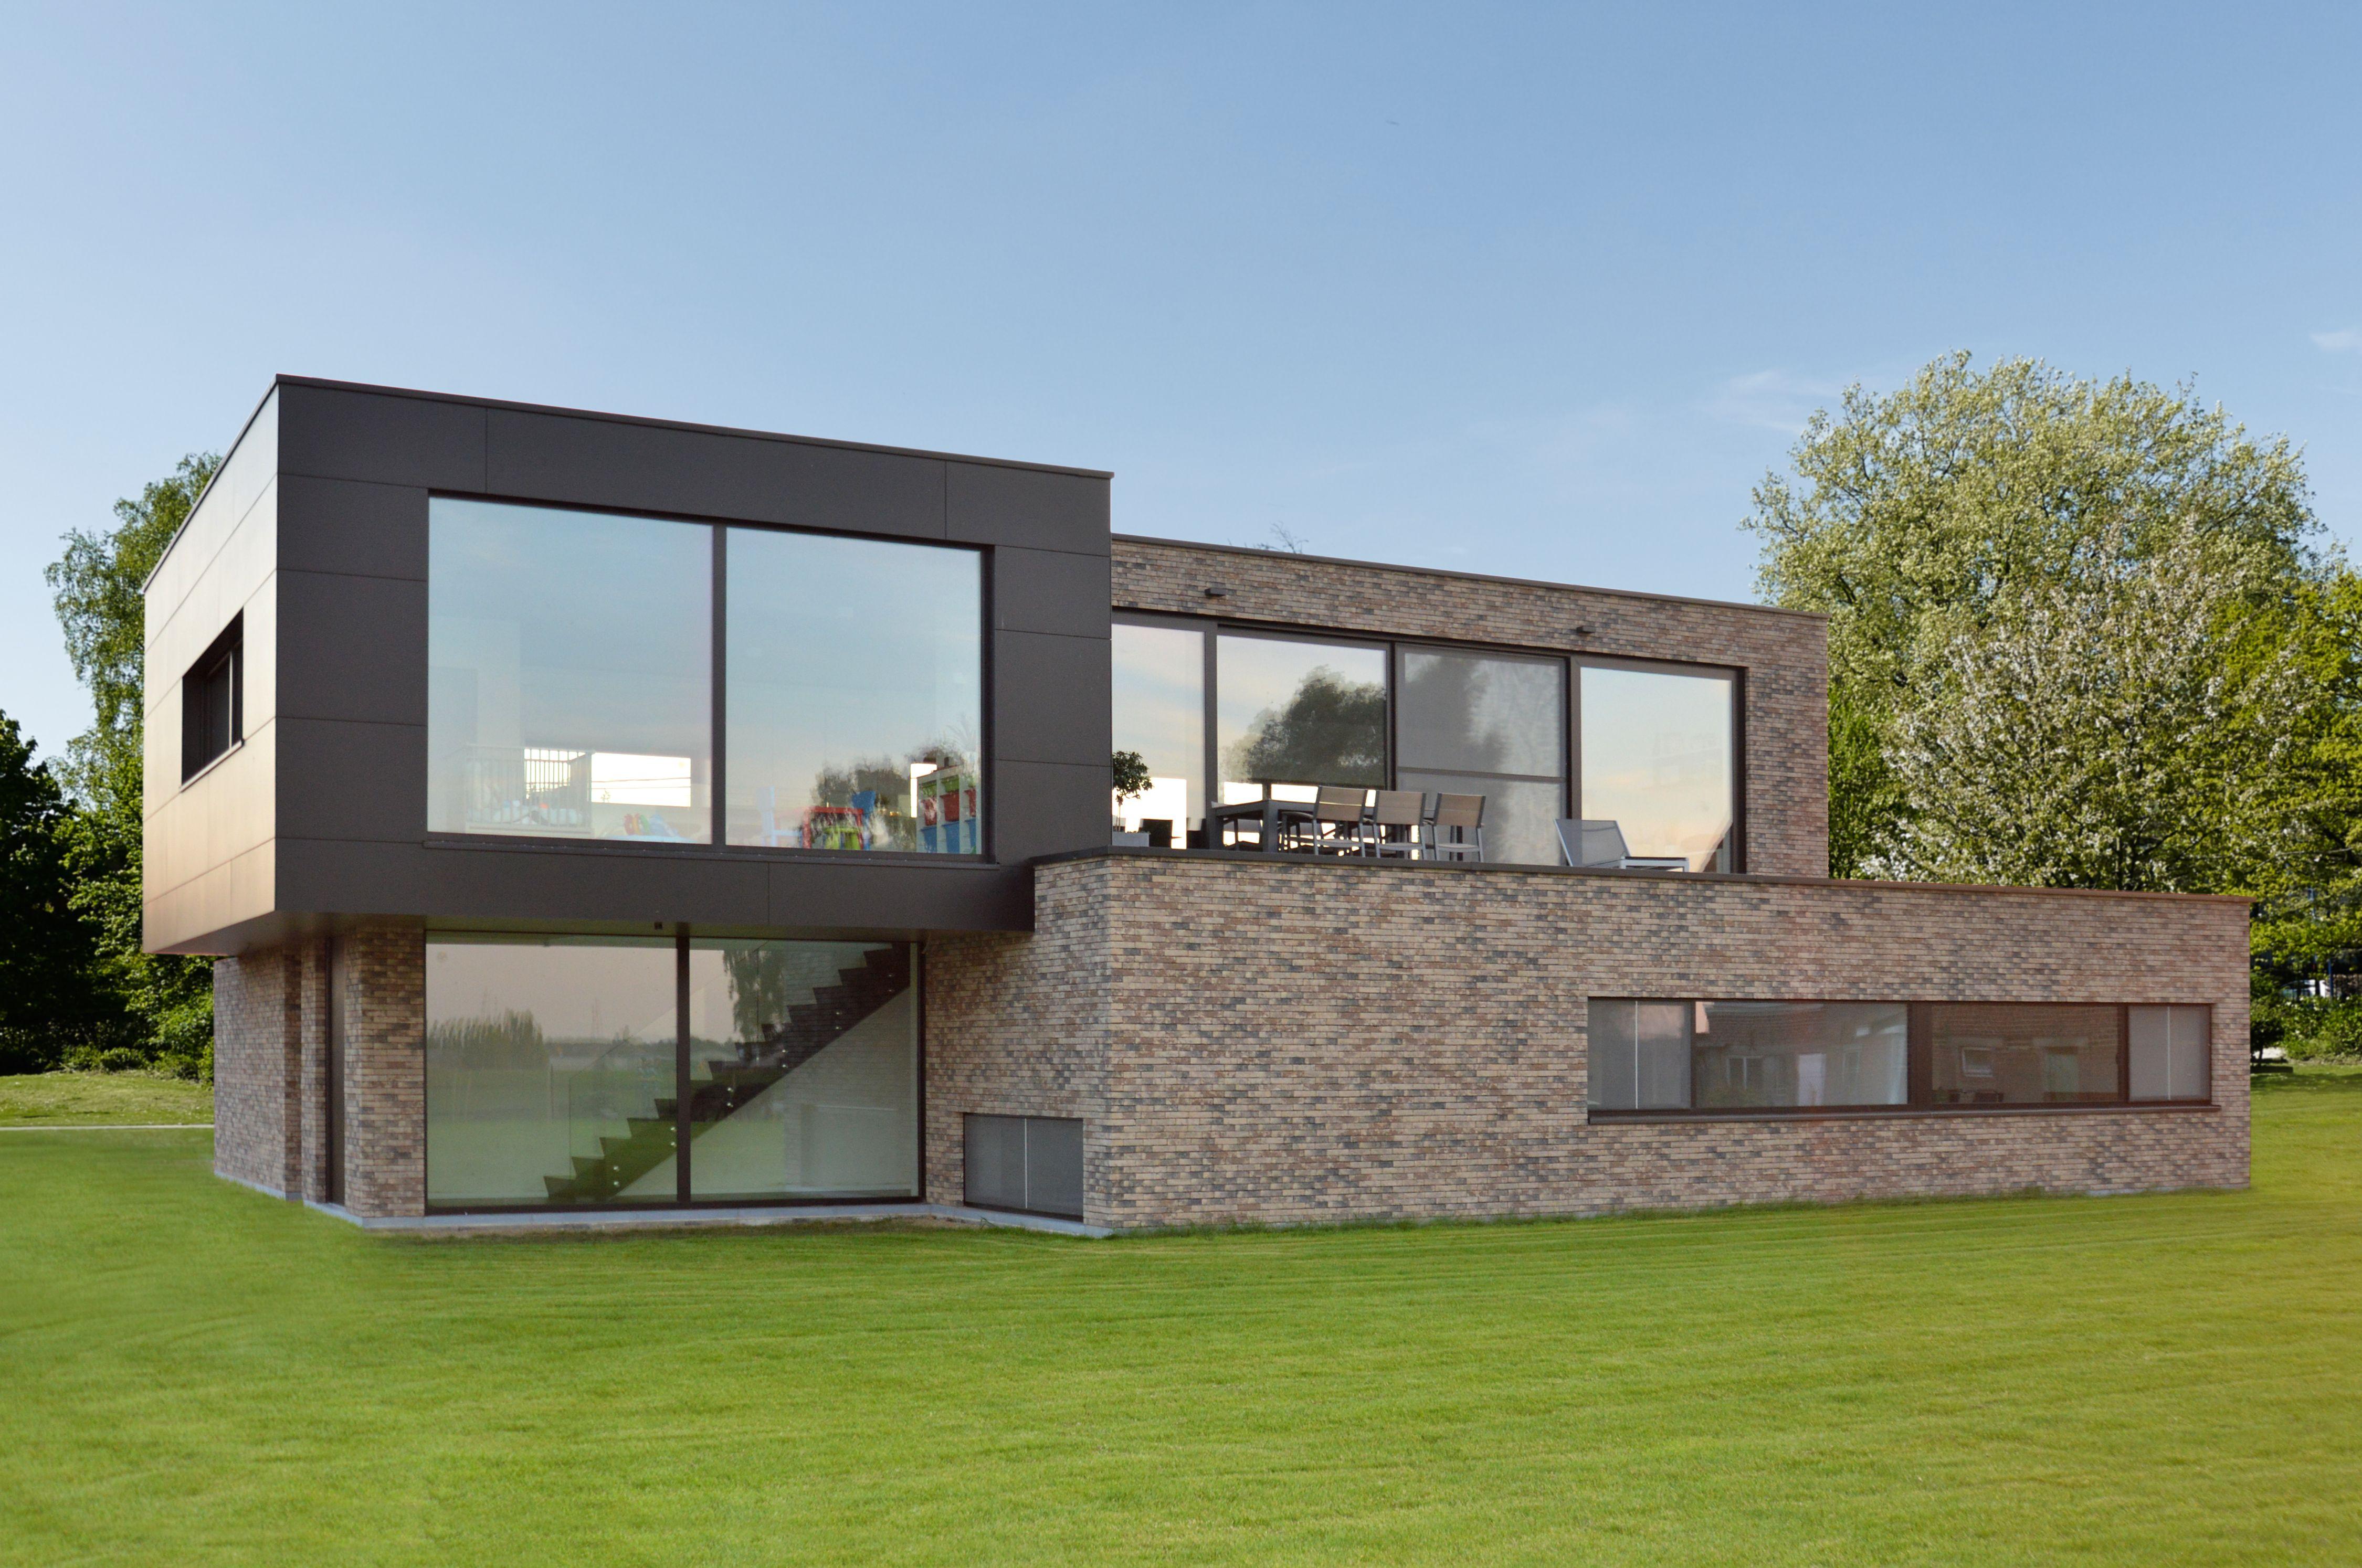 Hedendaagse bel etage ben woning huisje pinterest house